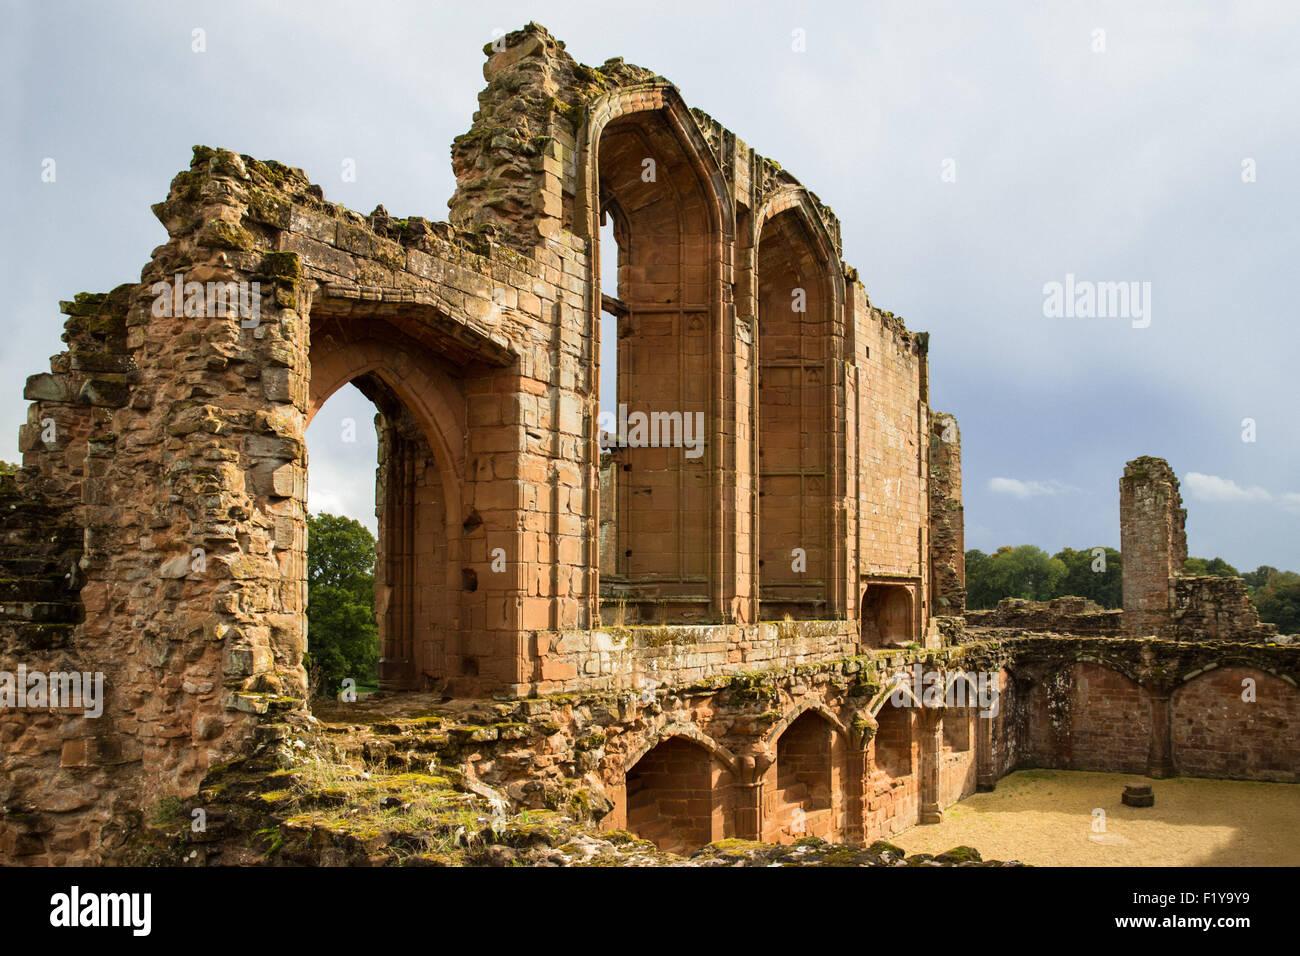 Ruin of Kenilworth Castle in Great Britain - Stock Image